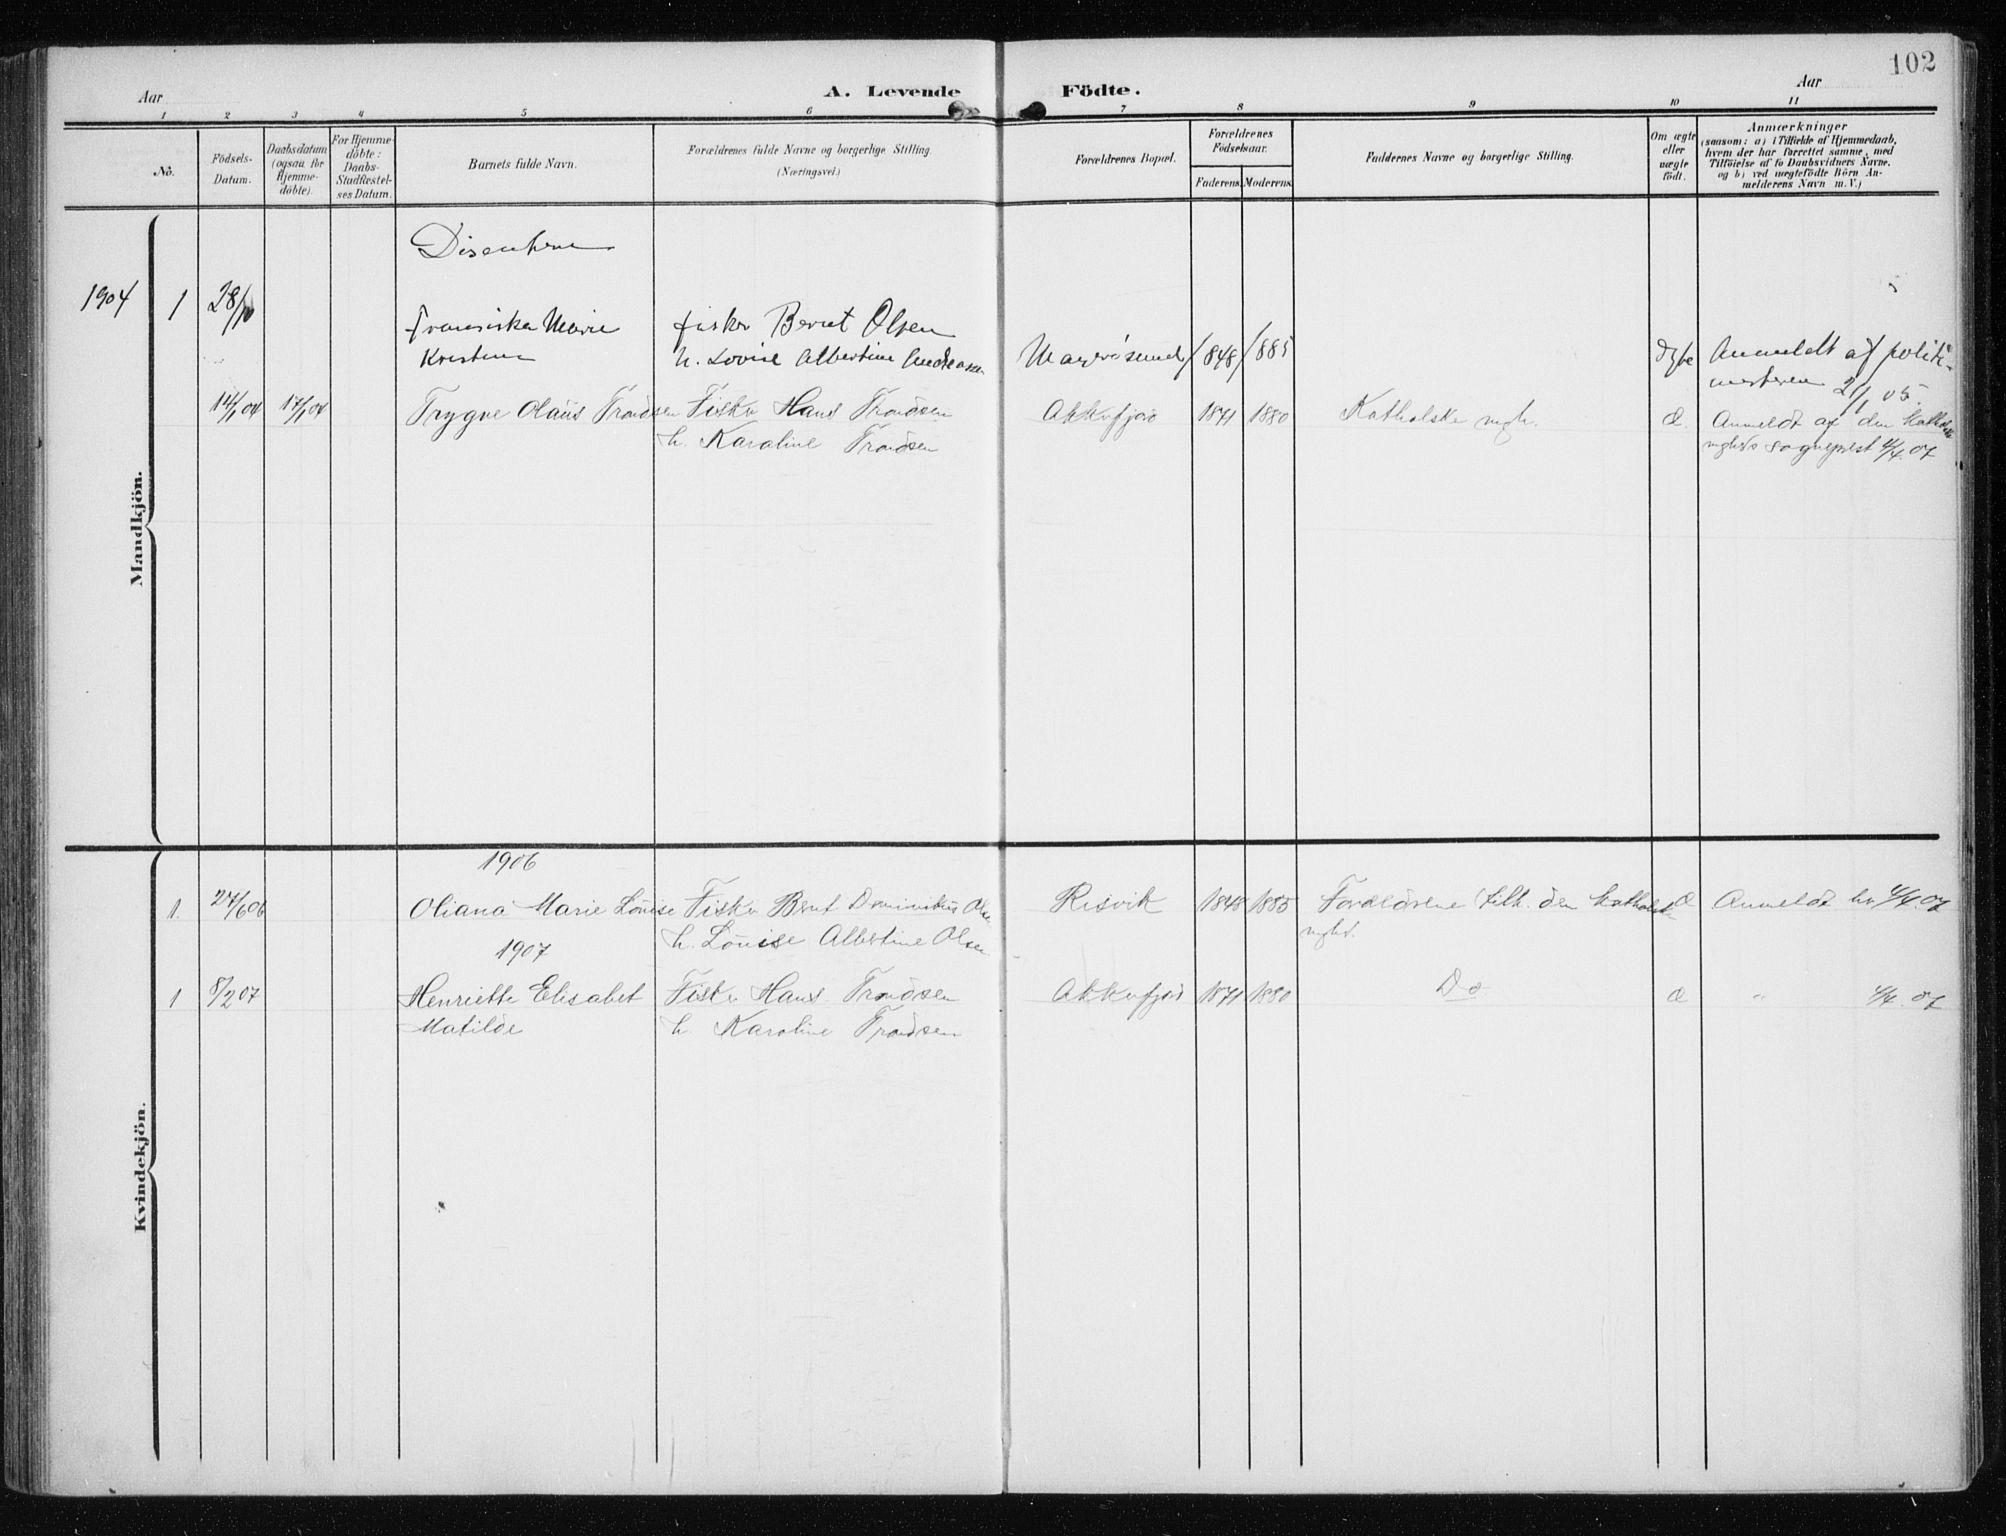 SATØ, Måsøy sokneprestkontor, H/Ha/L0009kirke: Ministerialbok nr. 9, 1903-1914, s. 102